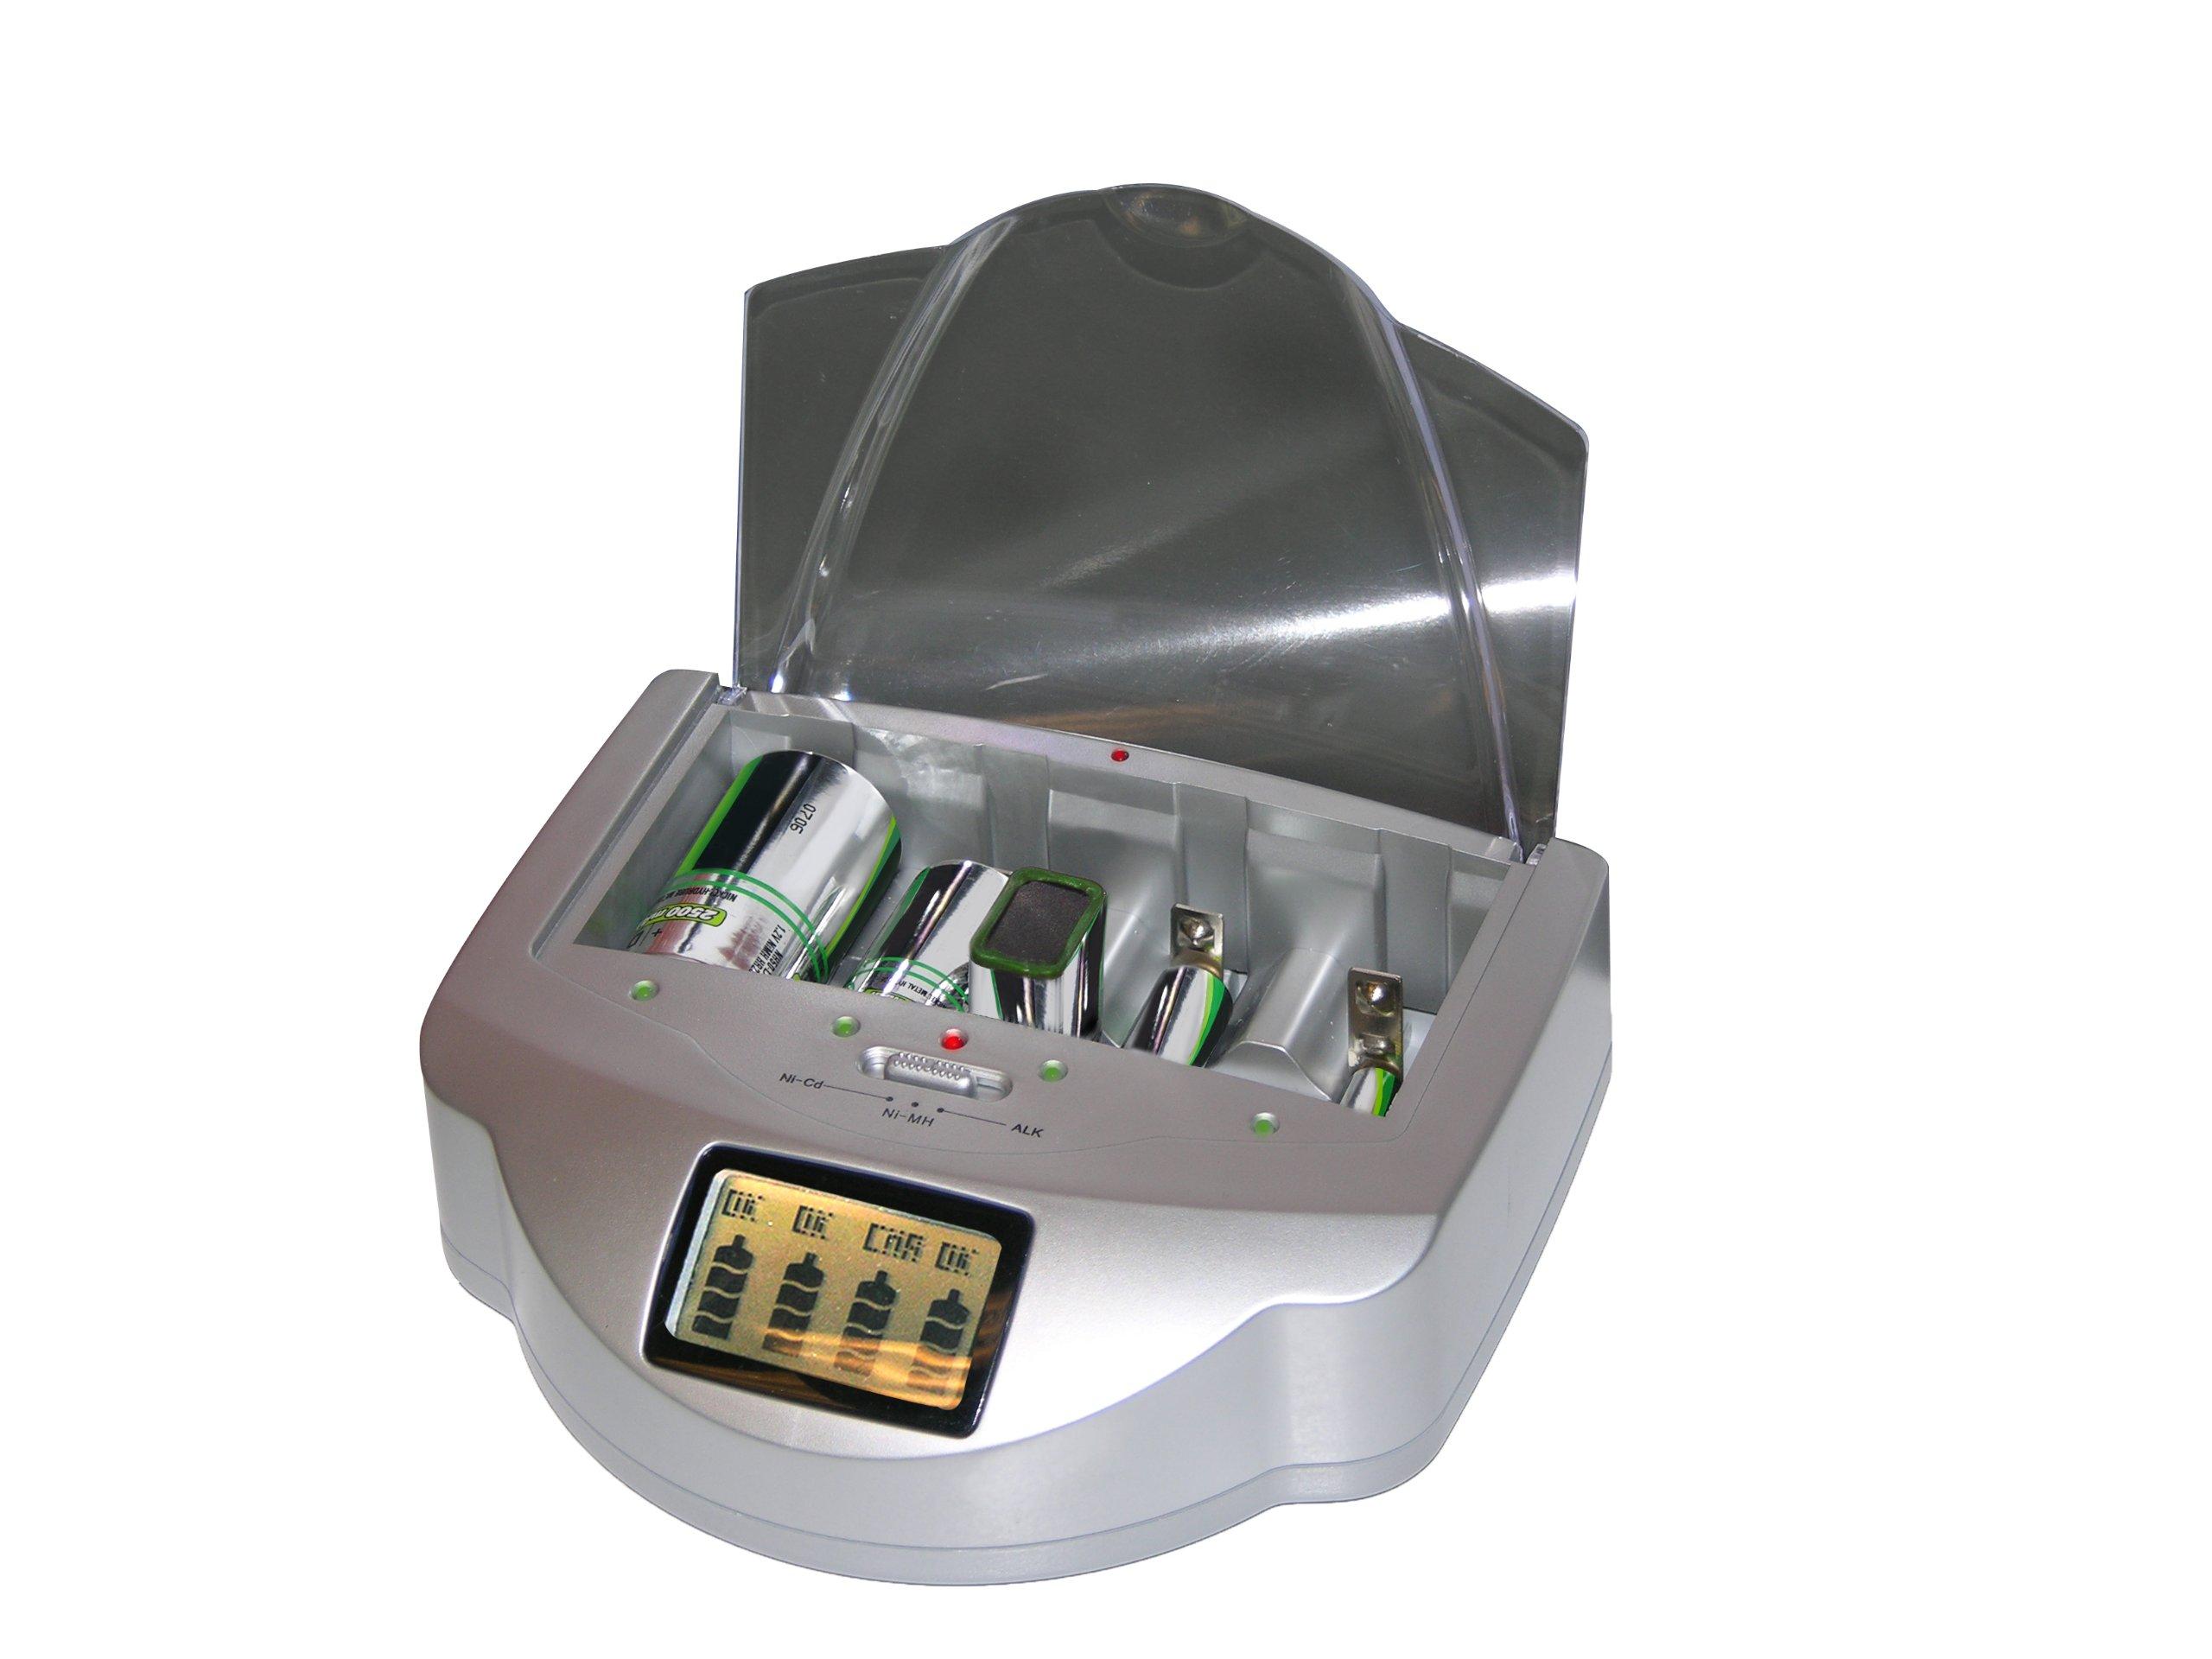 Viatek RE02G Renu-It Pro Series GrayProfessional Grad Disposable Battery Regenerator/Used for AA, AAA, C, D & 9-Volt Batteries